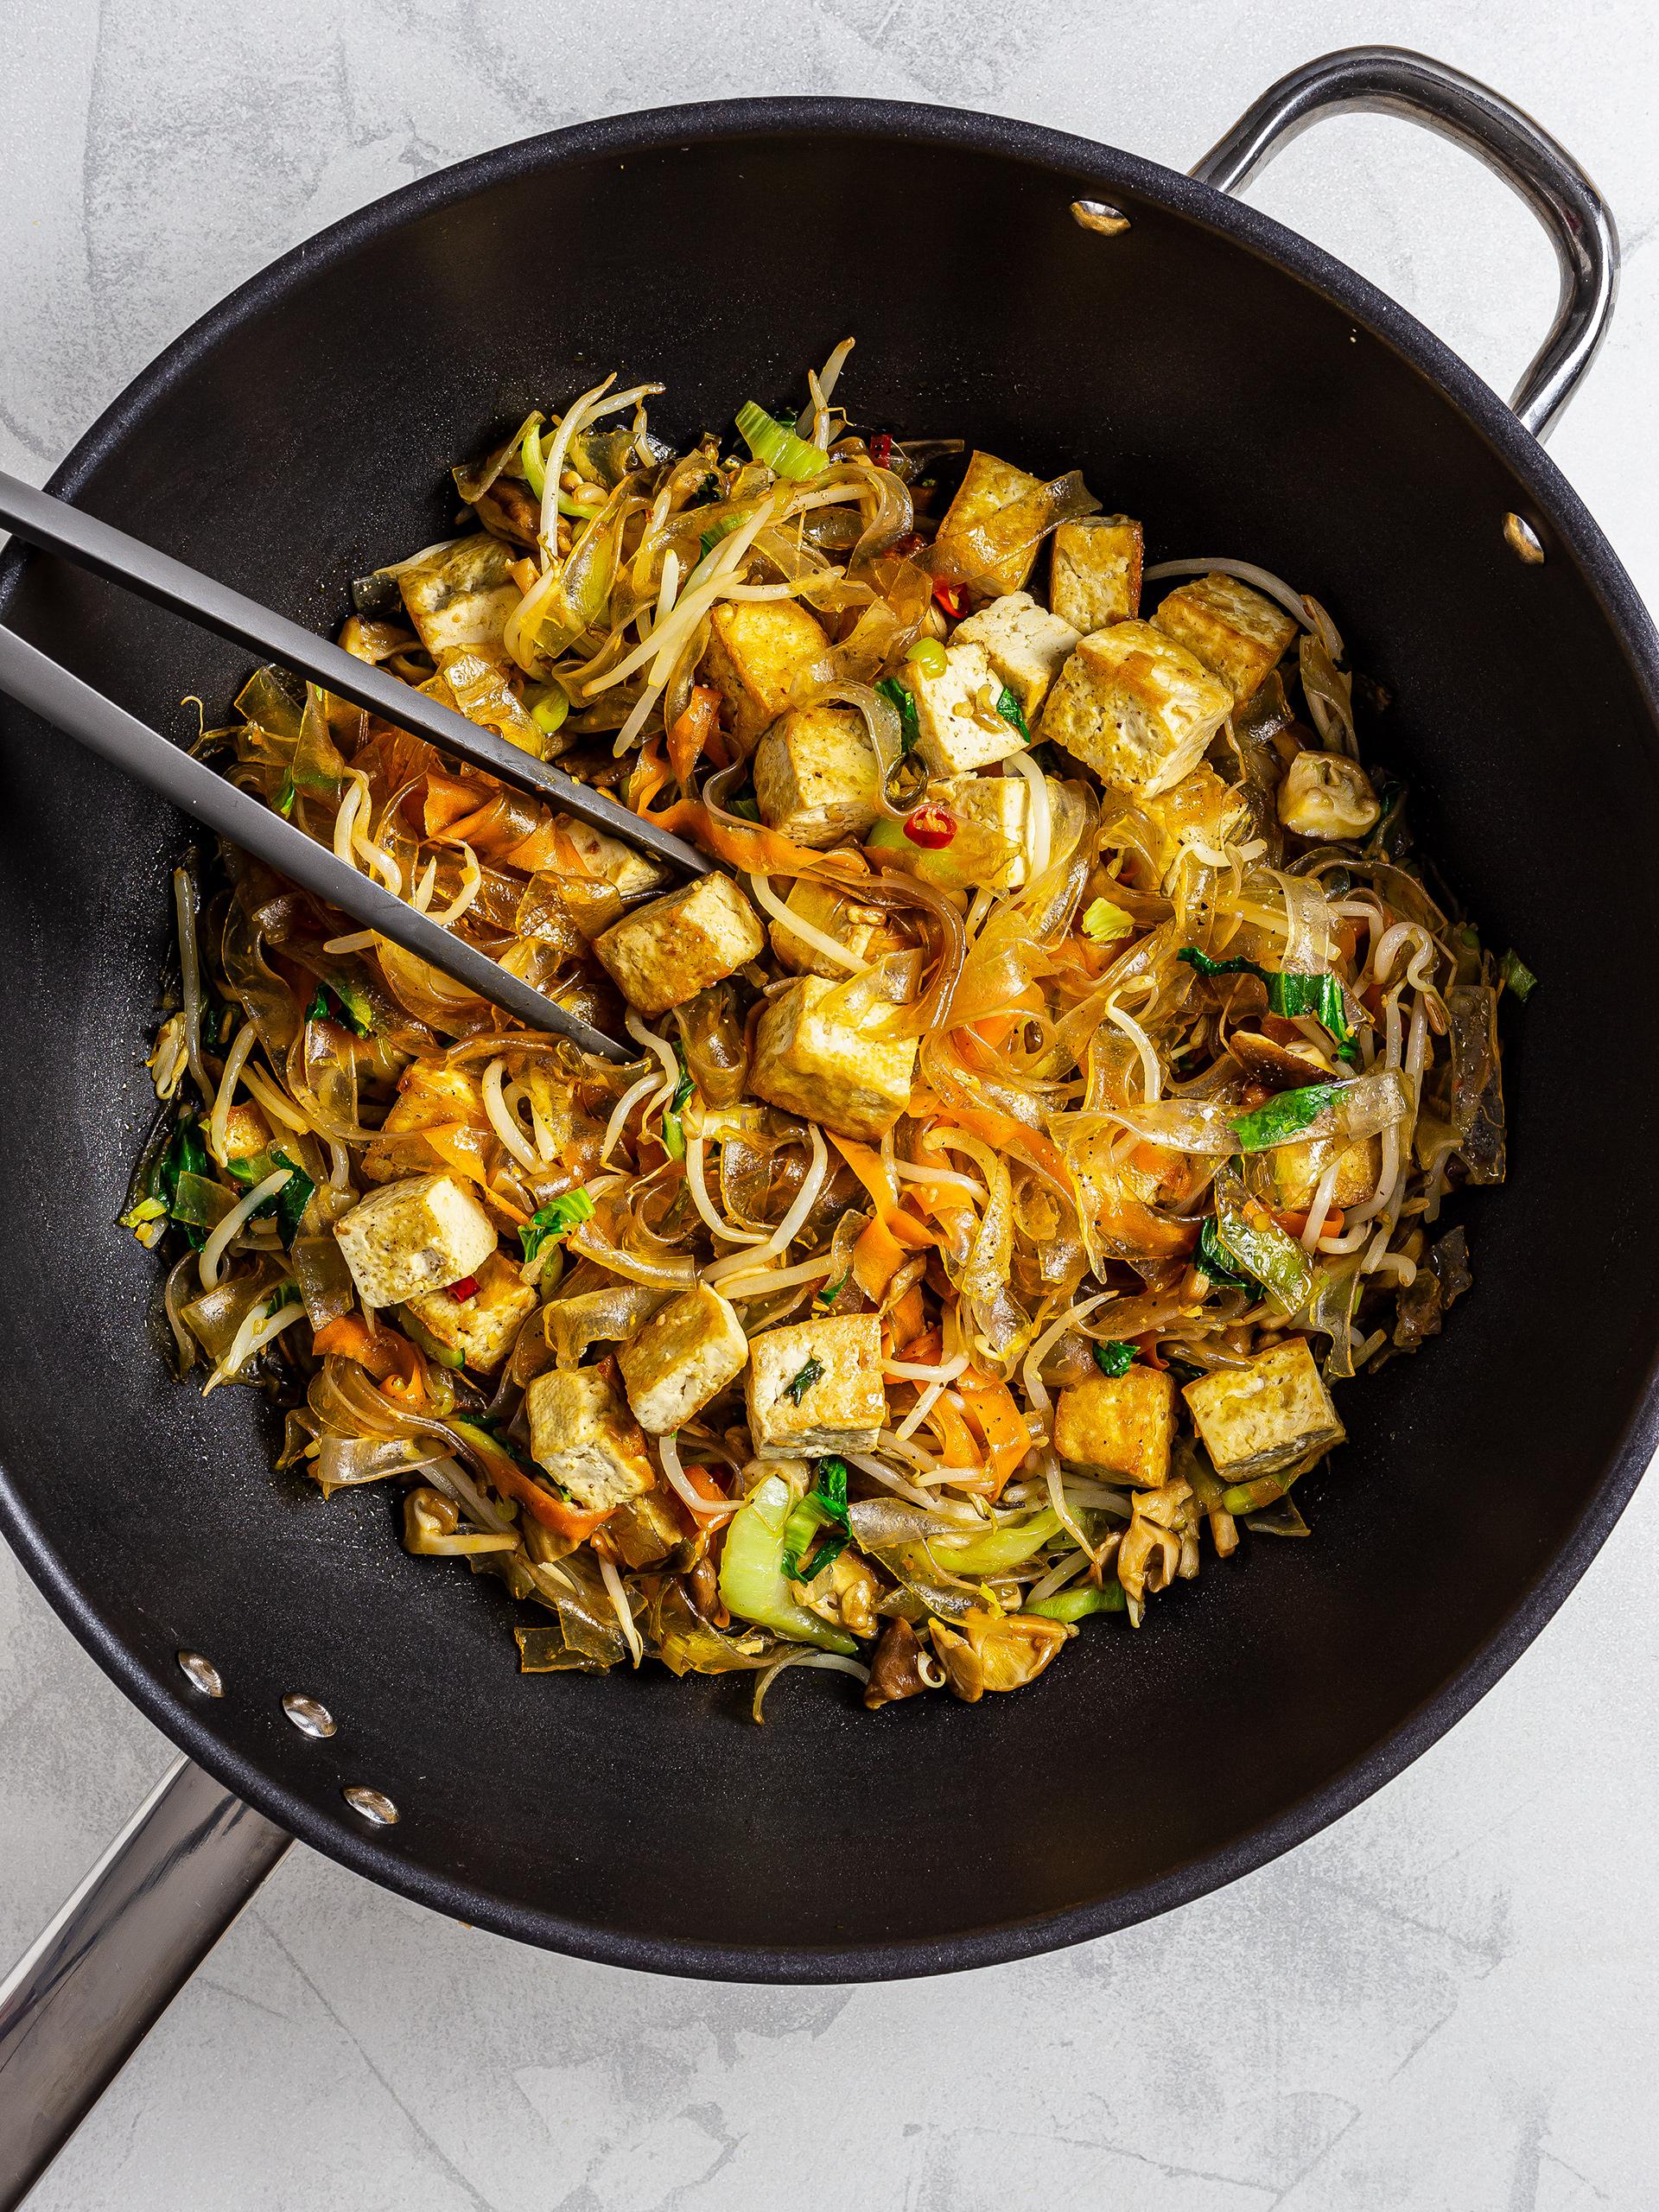 Thread noodles pad thai with tofu